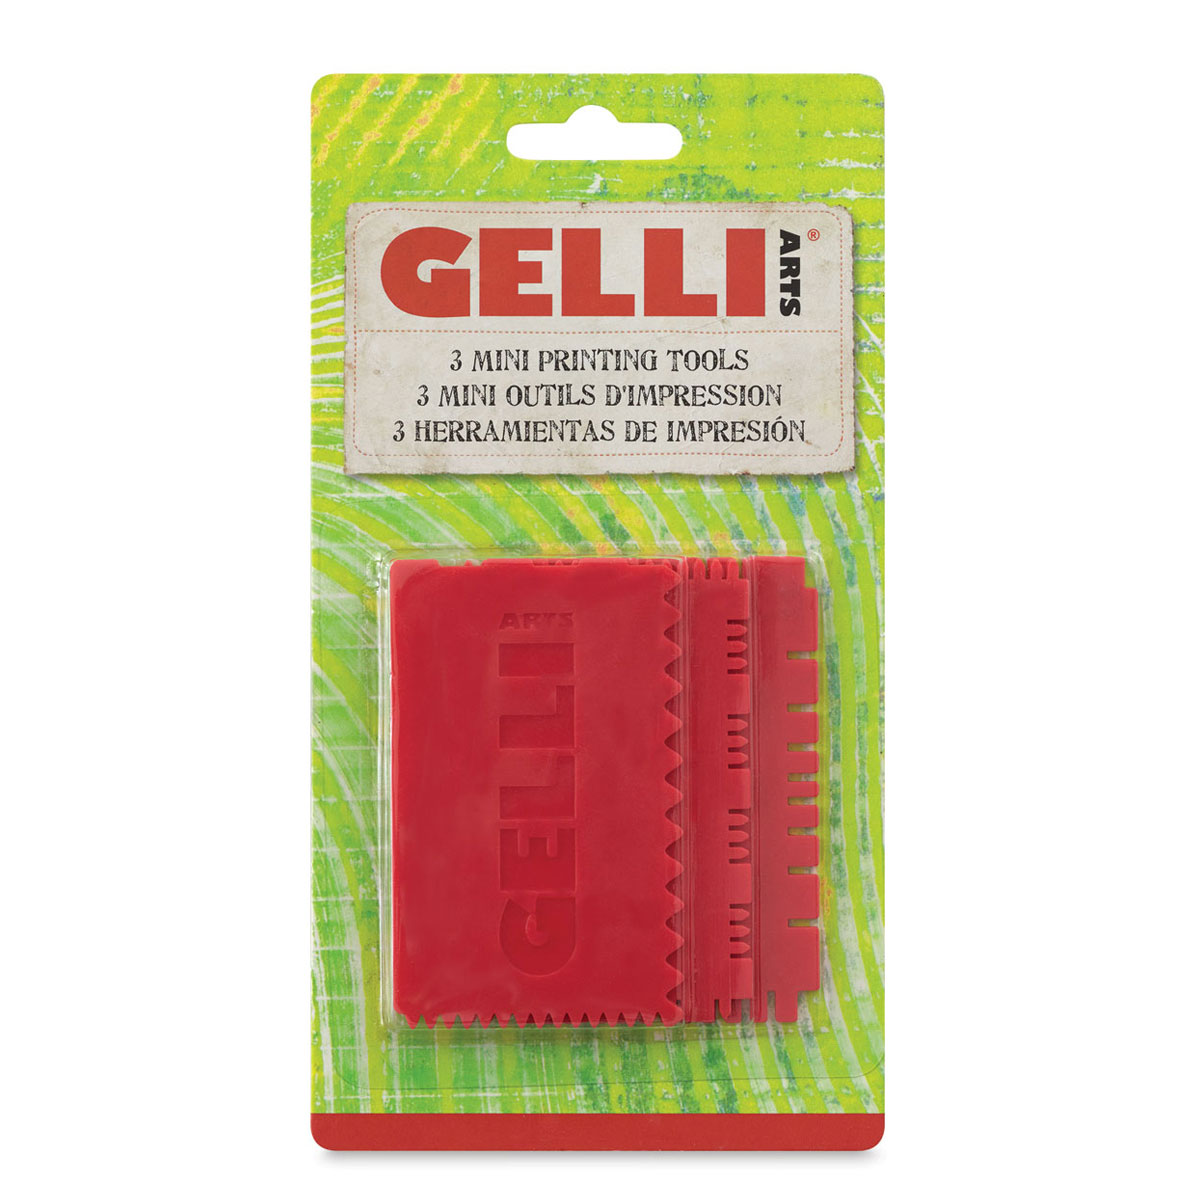 Gelli Arts Mini Printing Tools